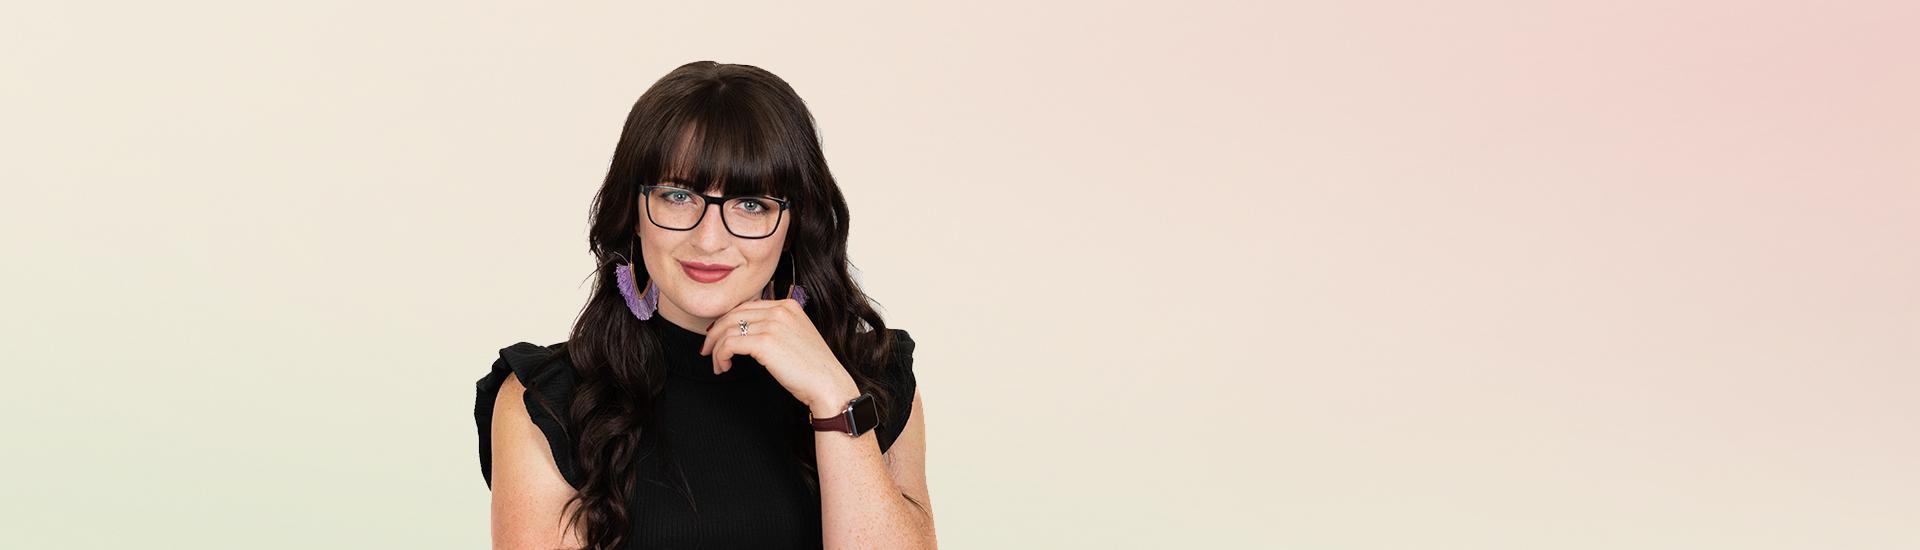 Vye Employee, Clare Richards, Named 5 Under 40